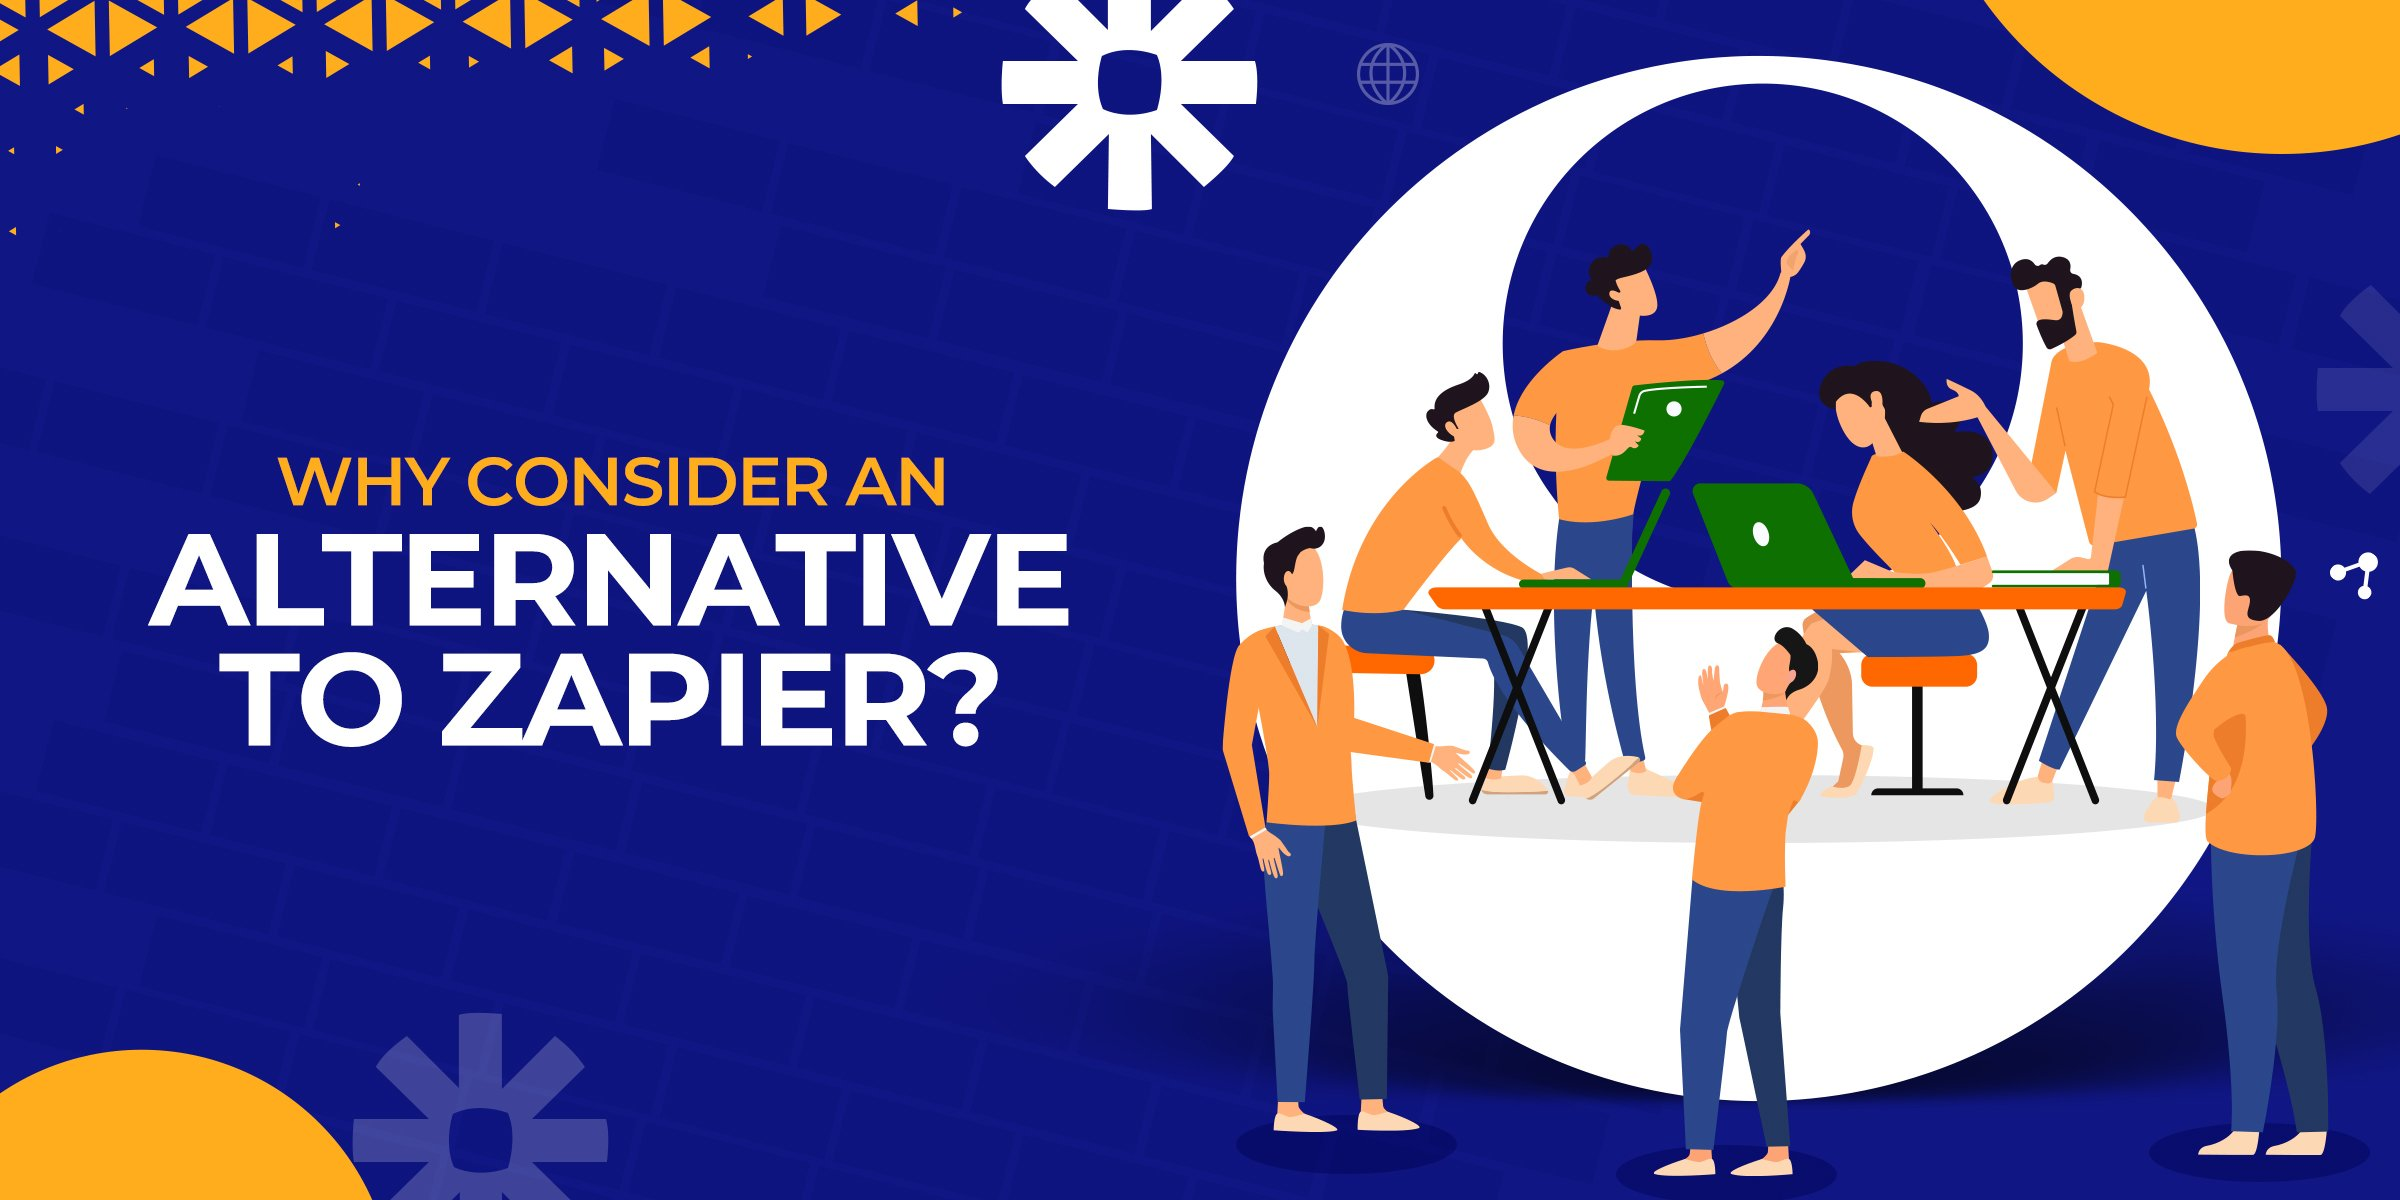 Why Consider an Alternative to Zapier?